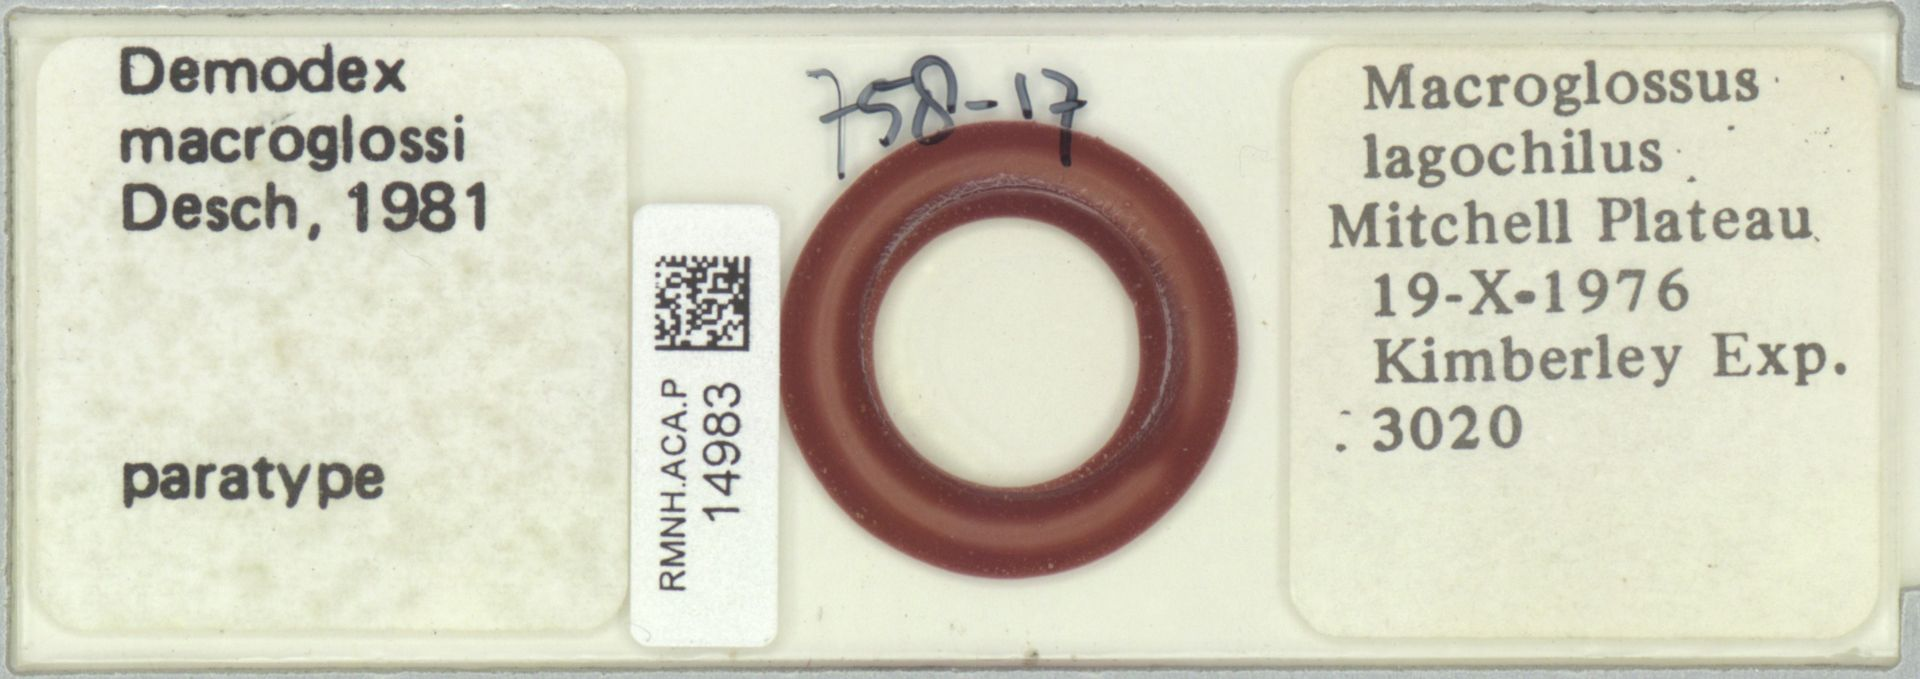 RMNH.ACA.P.14983 | Demodex macroglossi Desch, 1981